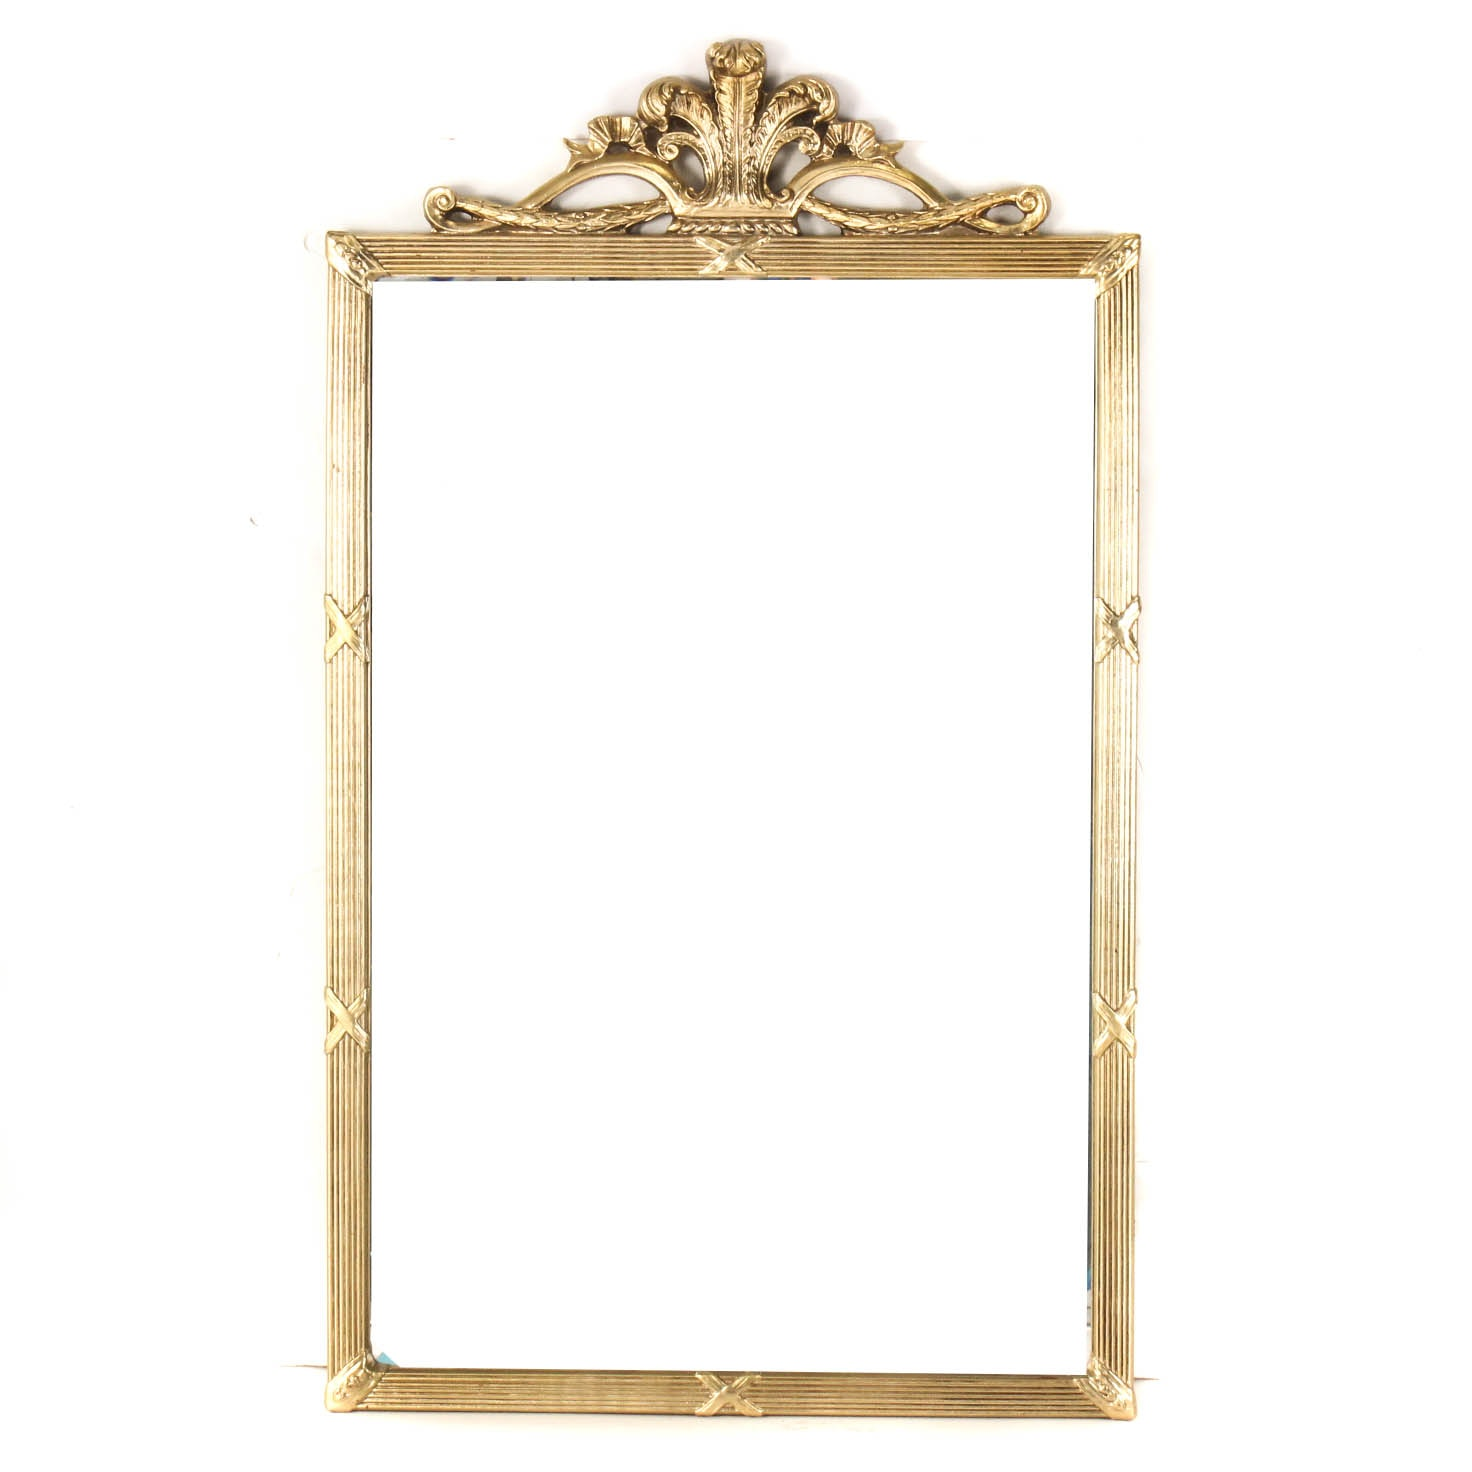 Ornate Gold Tone Wall Mirror